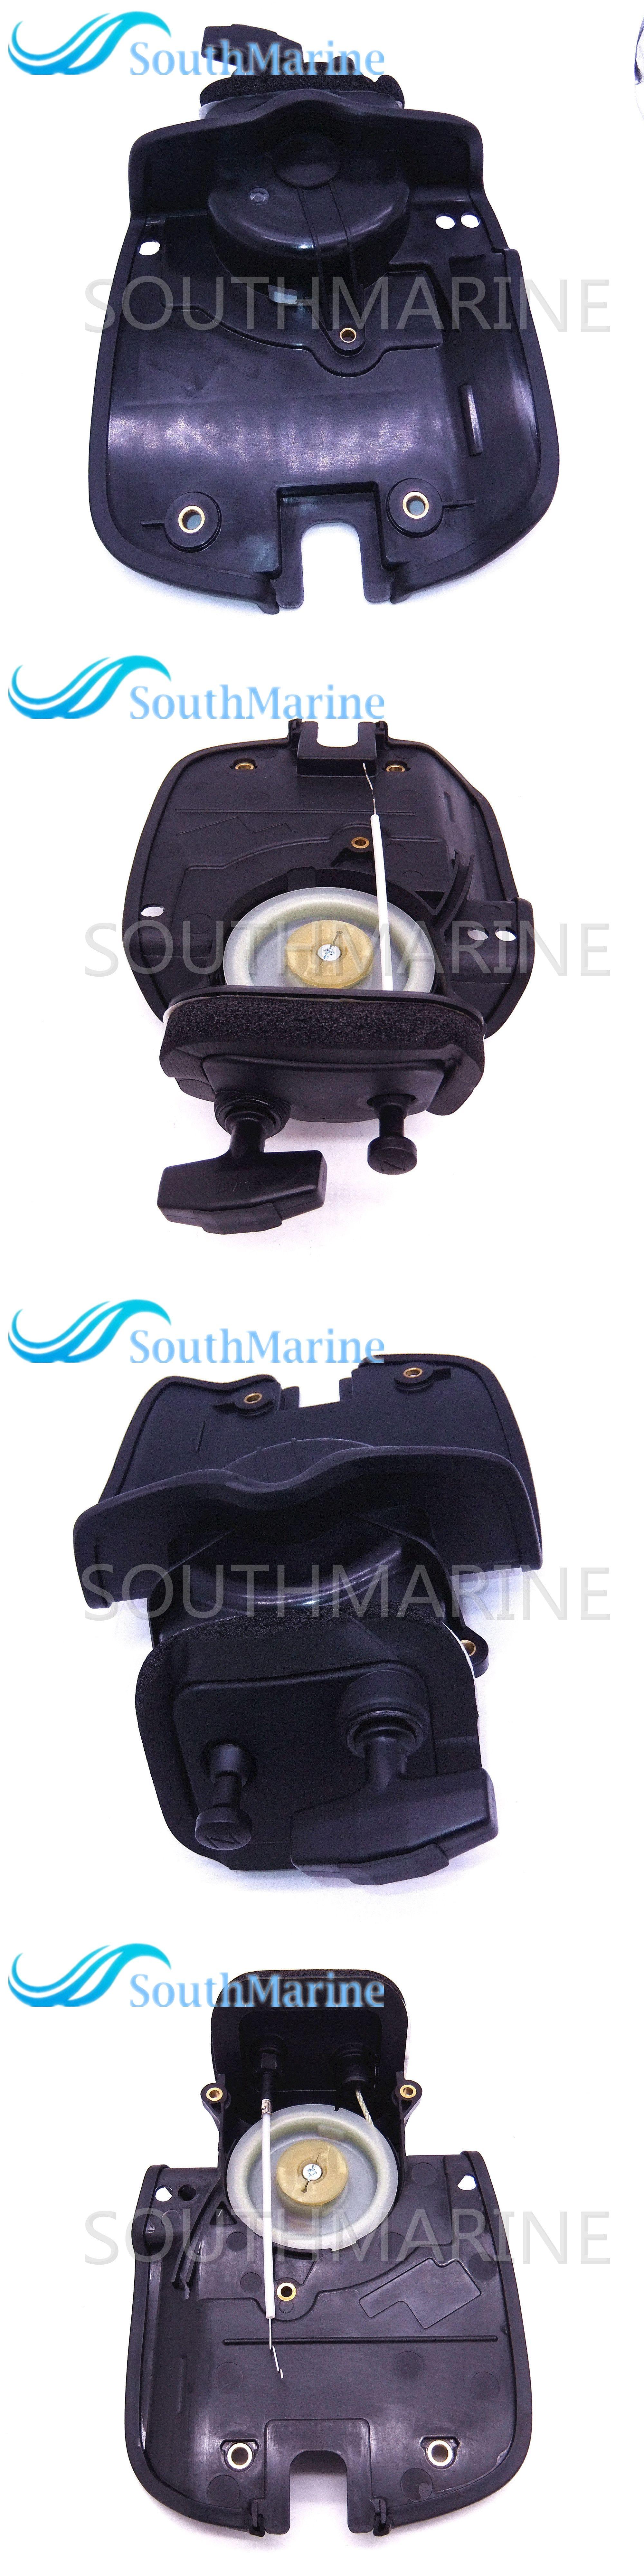 697-15789-00-00 Rubber Damper  for Yamaha Parsun Outboard Engine Motor Part